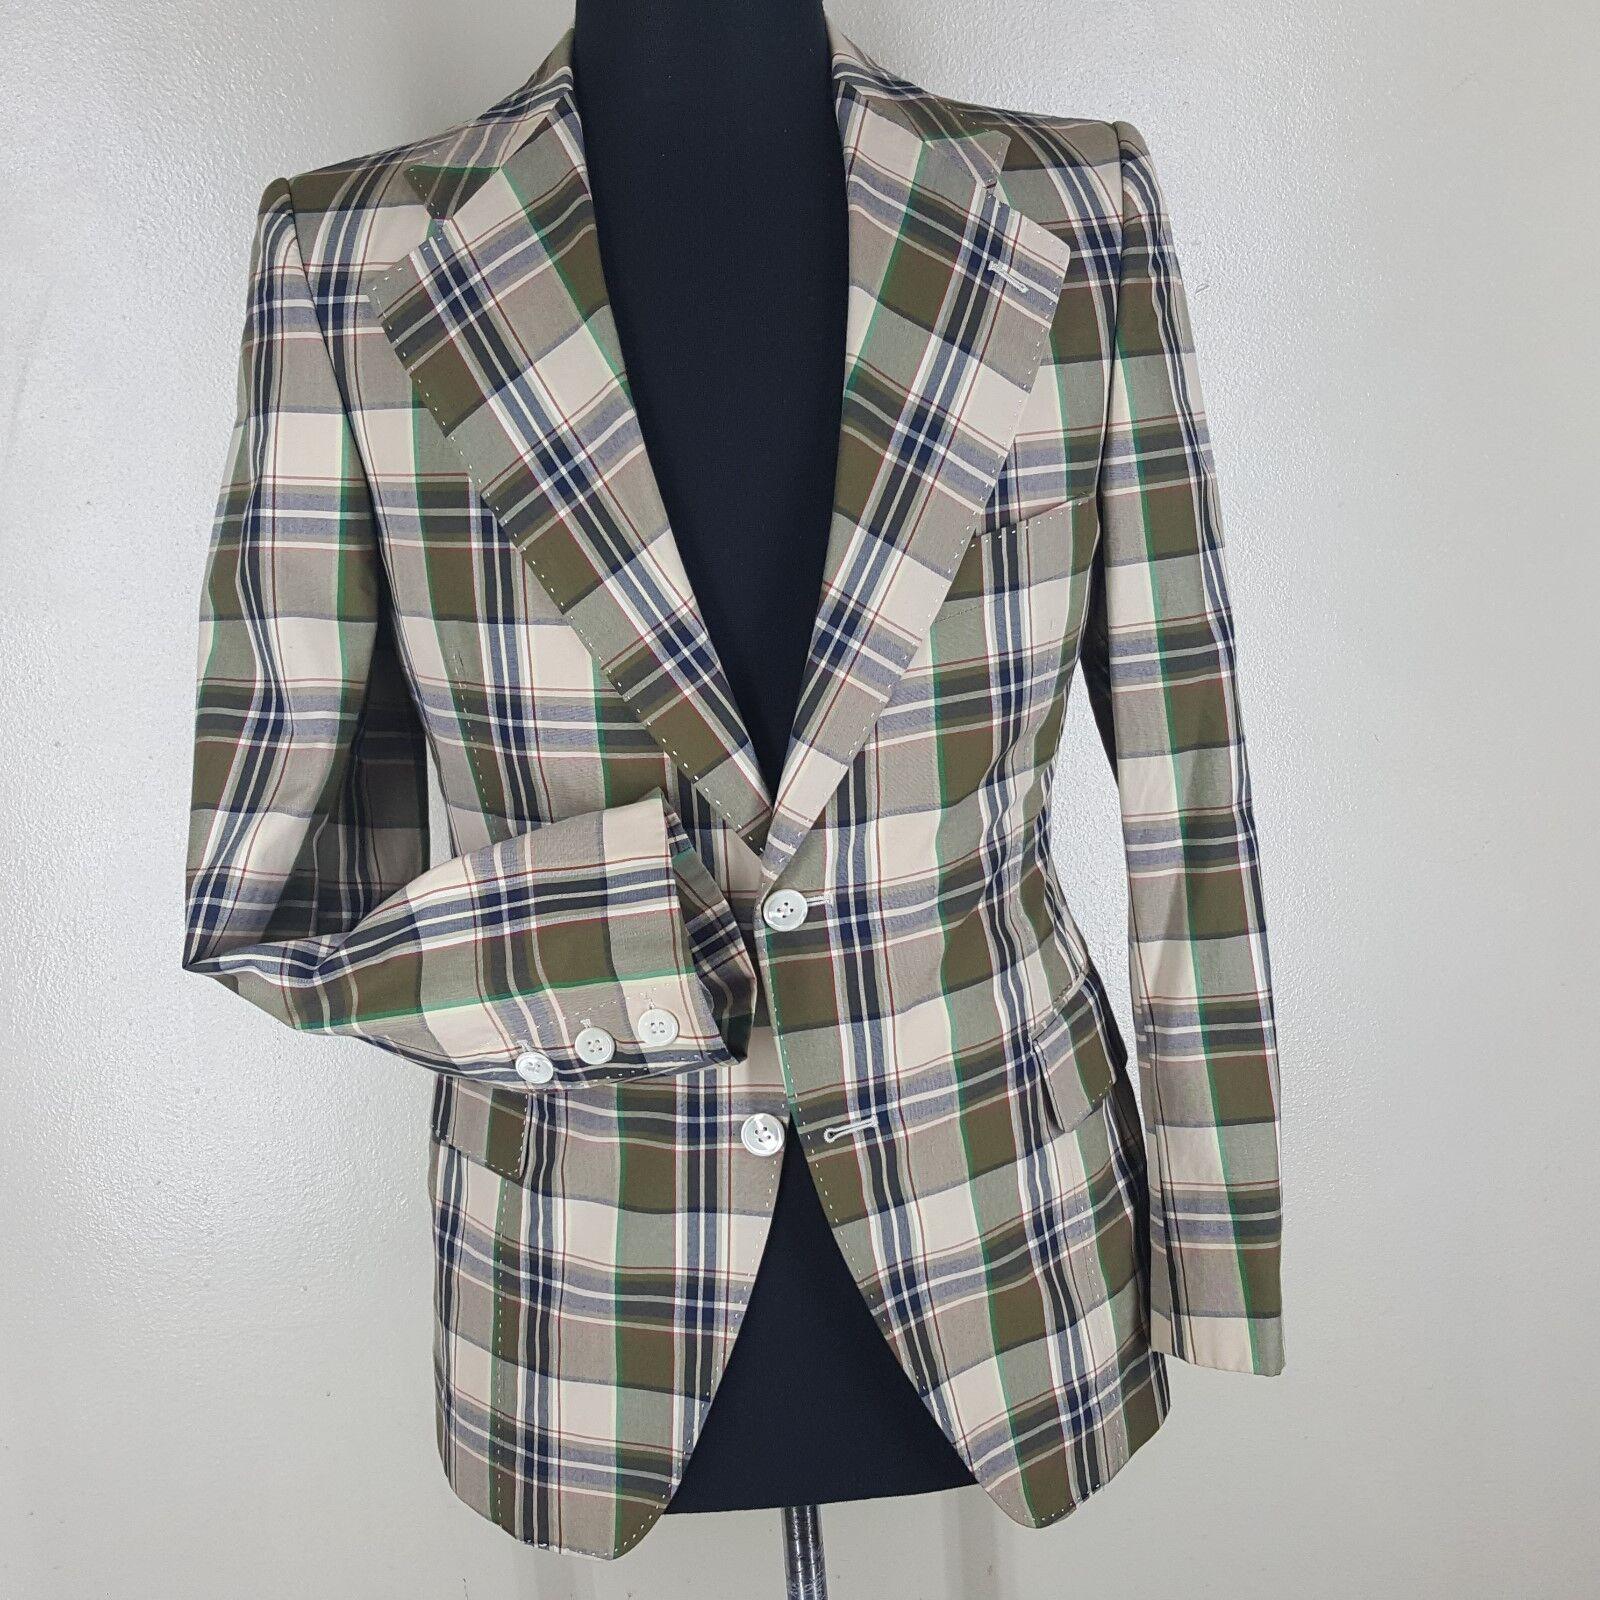 JUNYA WATANABE Comme De Garsons Recent 100% Cotton Blazer 2 Btn  Fit 35-37 Short